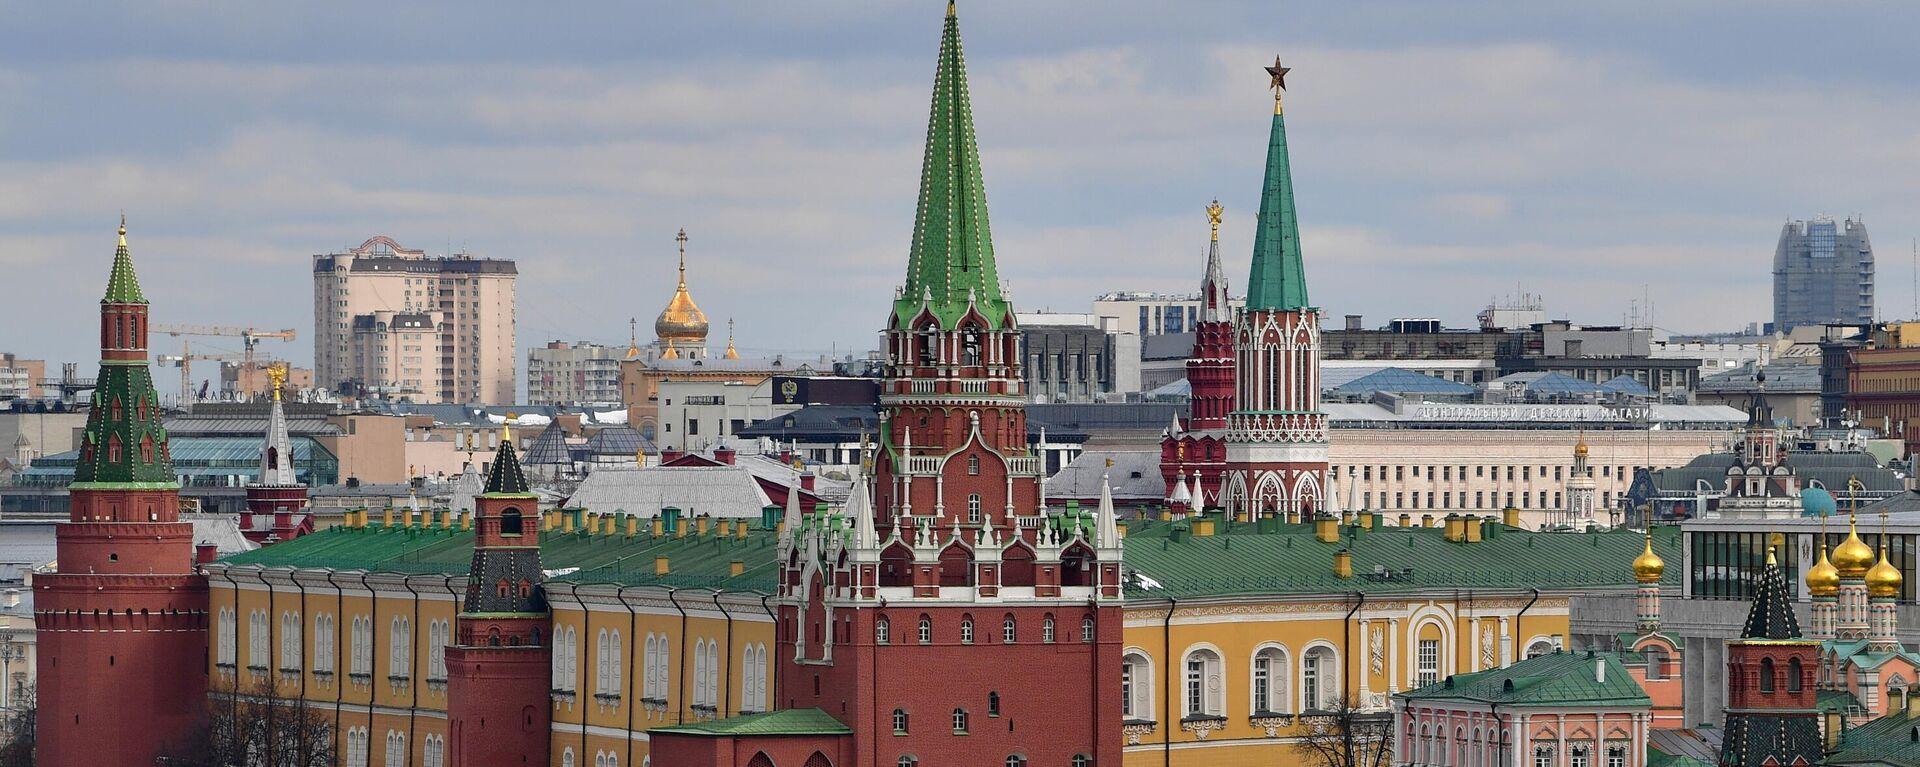 El Kremlin, Rusia - Sputnik Mundo, 1920, 23.08.2021